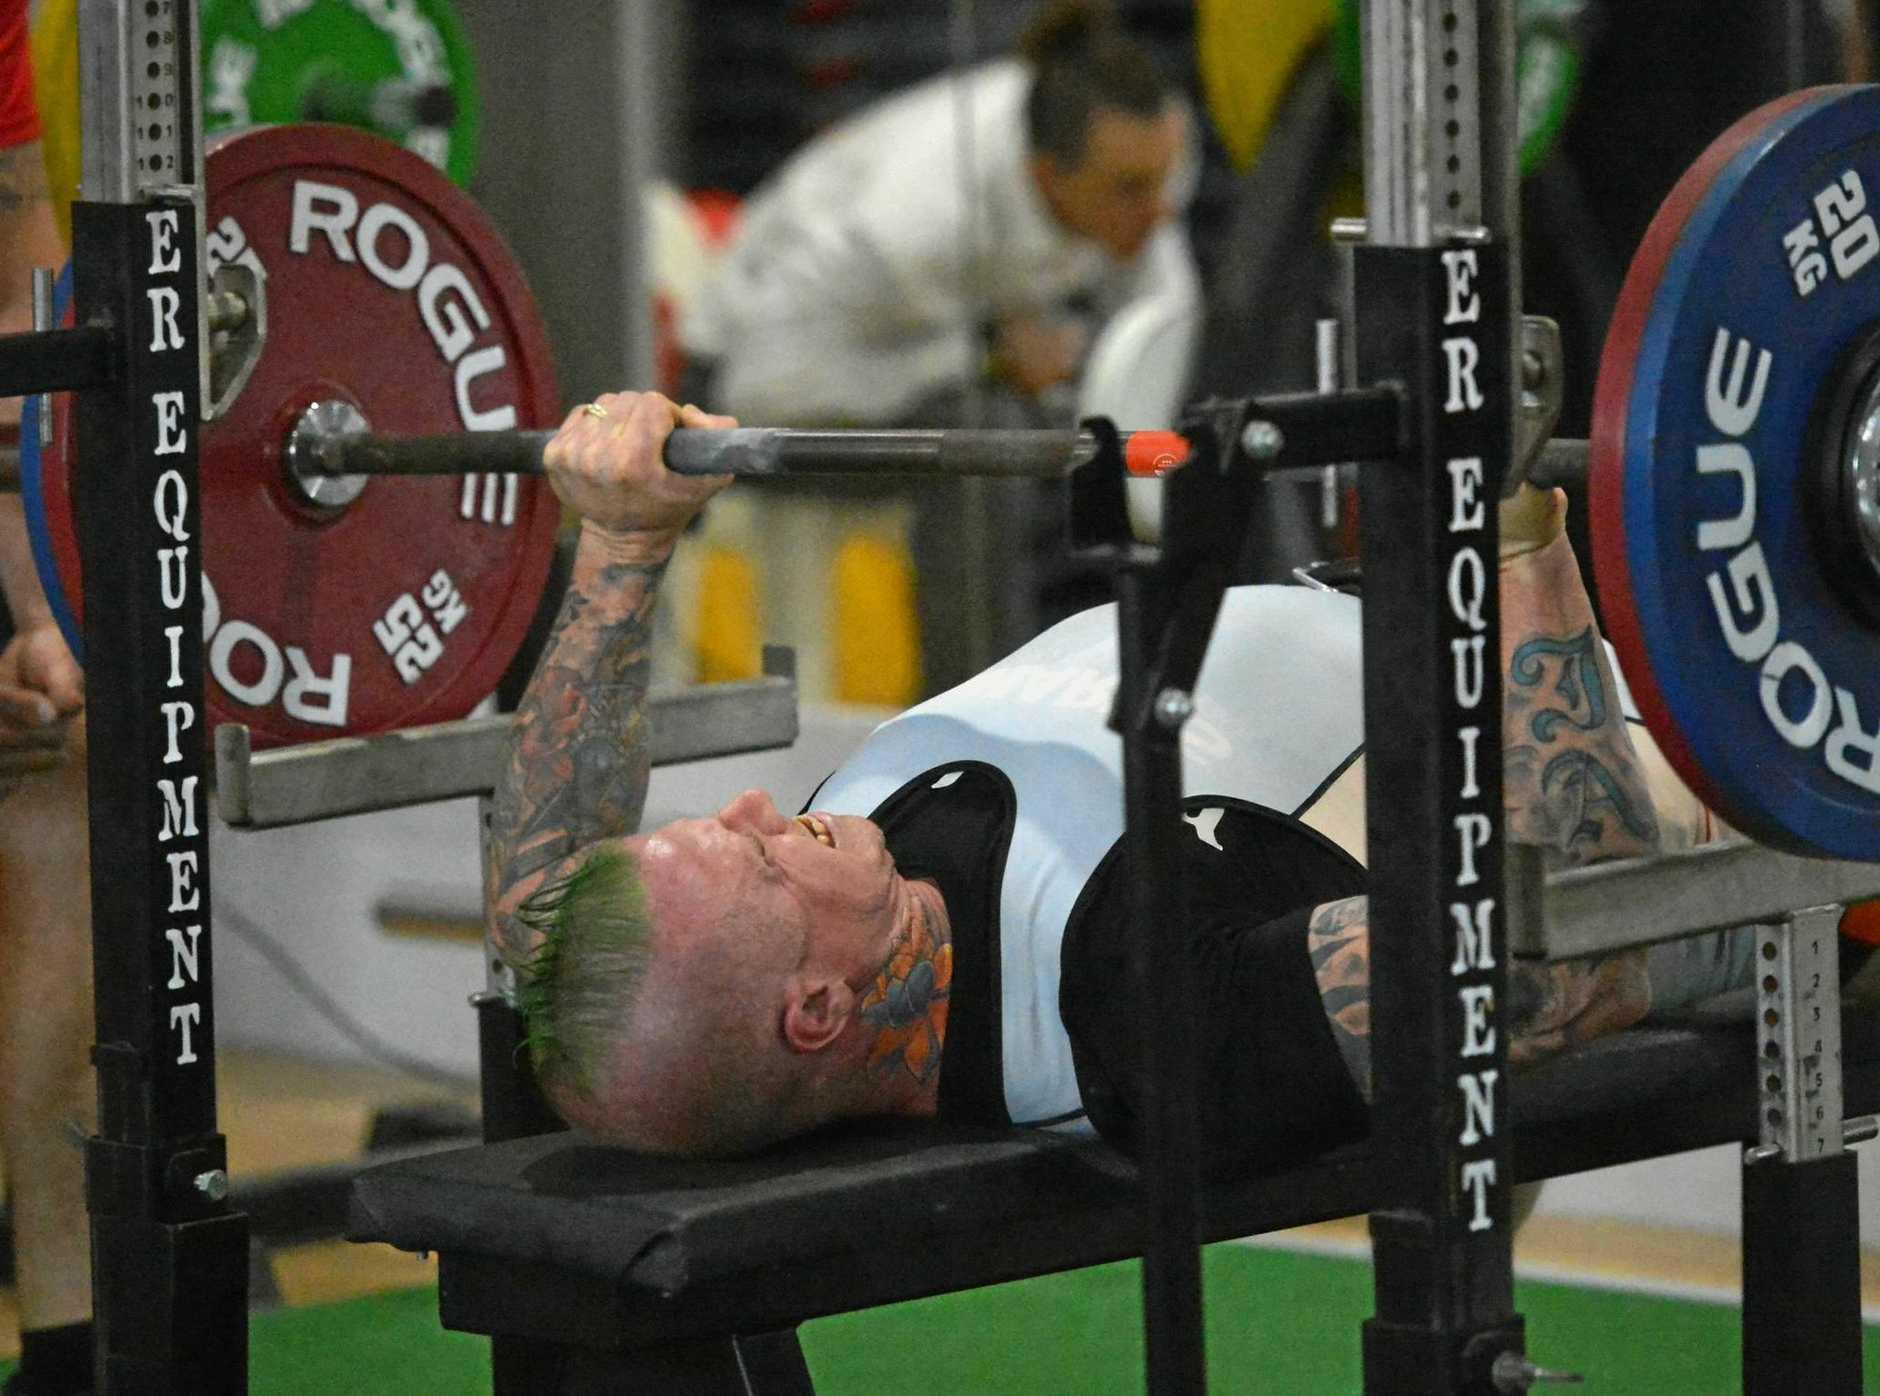 Gympie power lifter Nigel Daniel in action in the bench press.